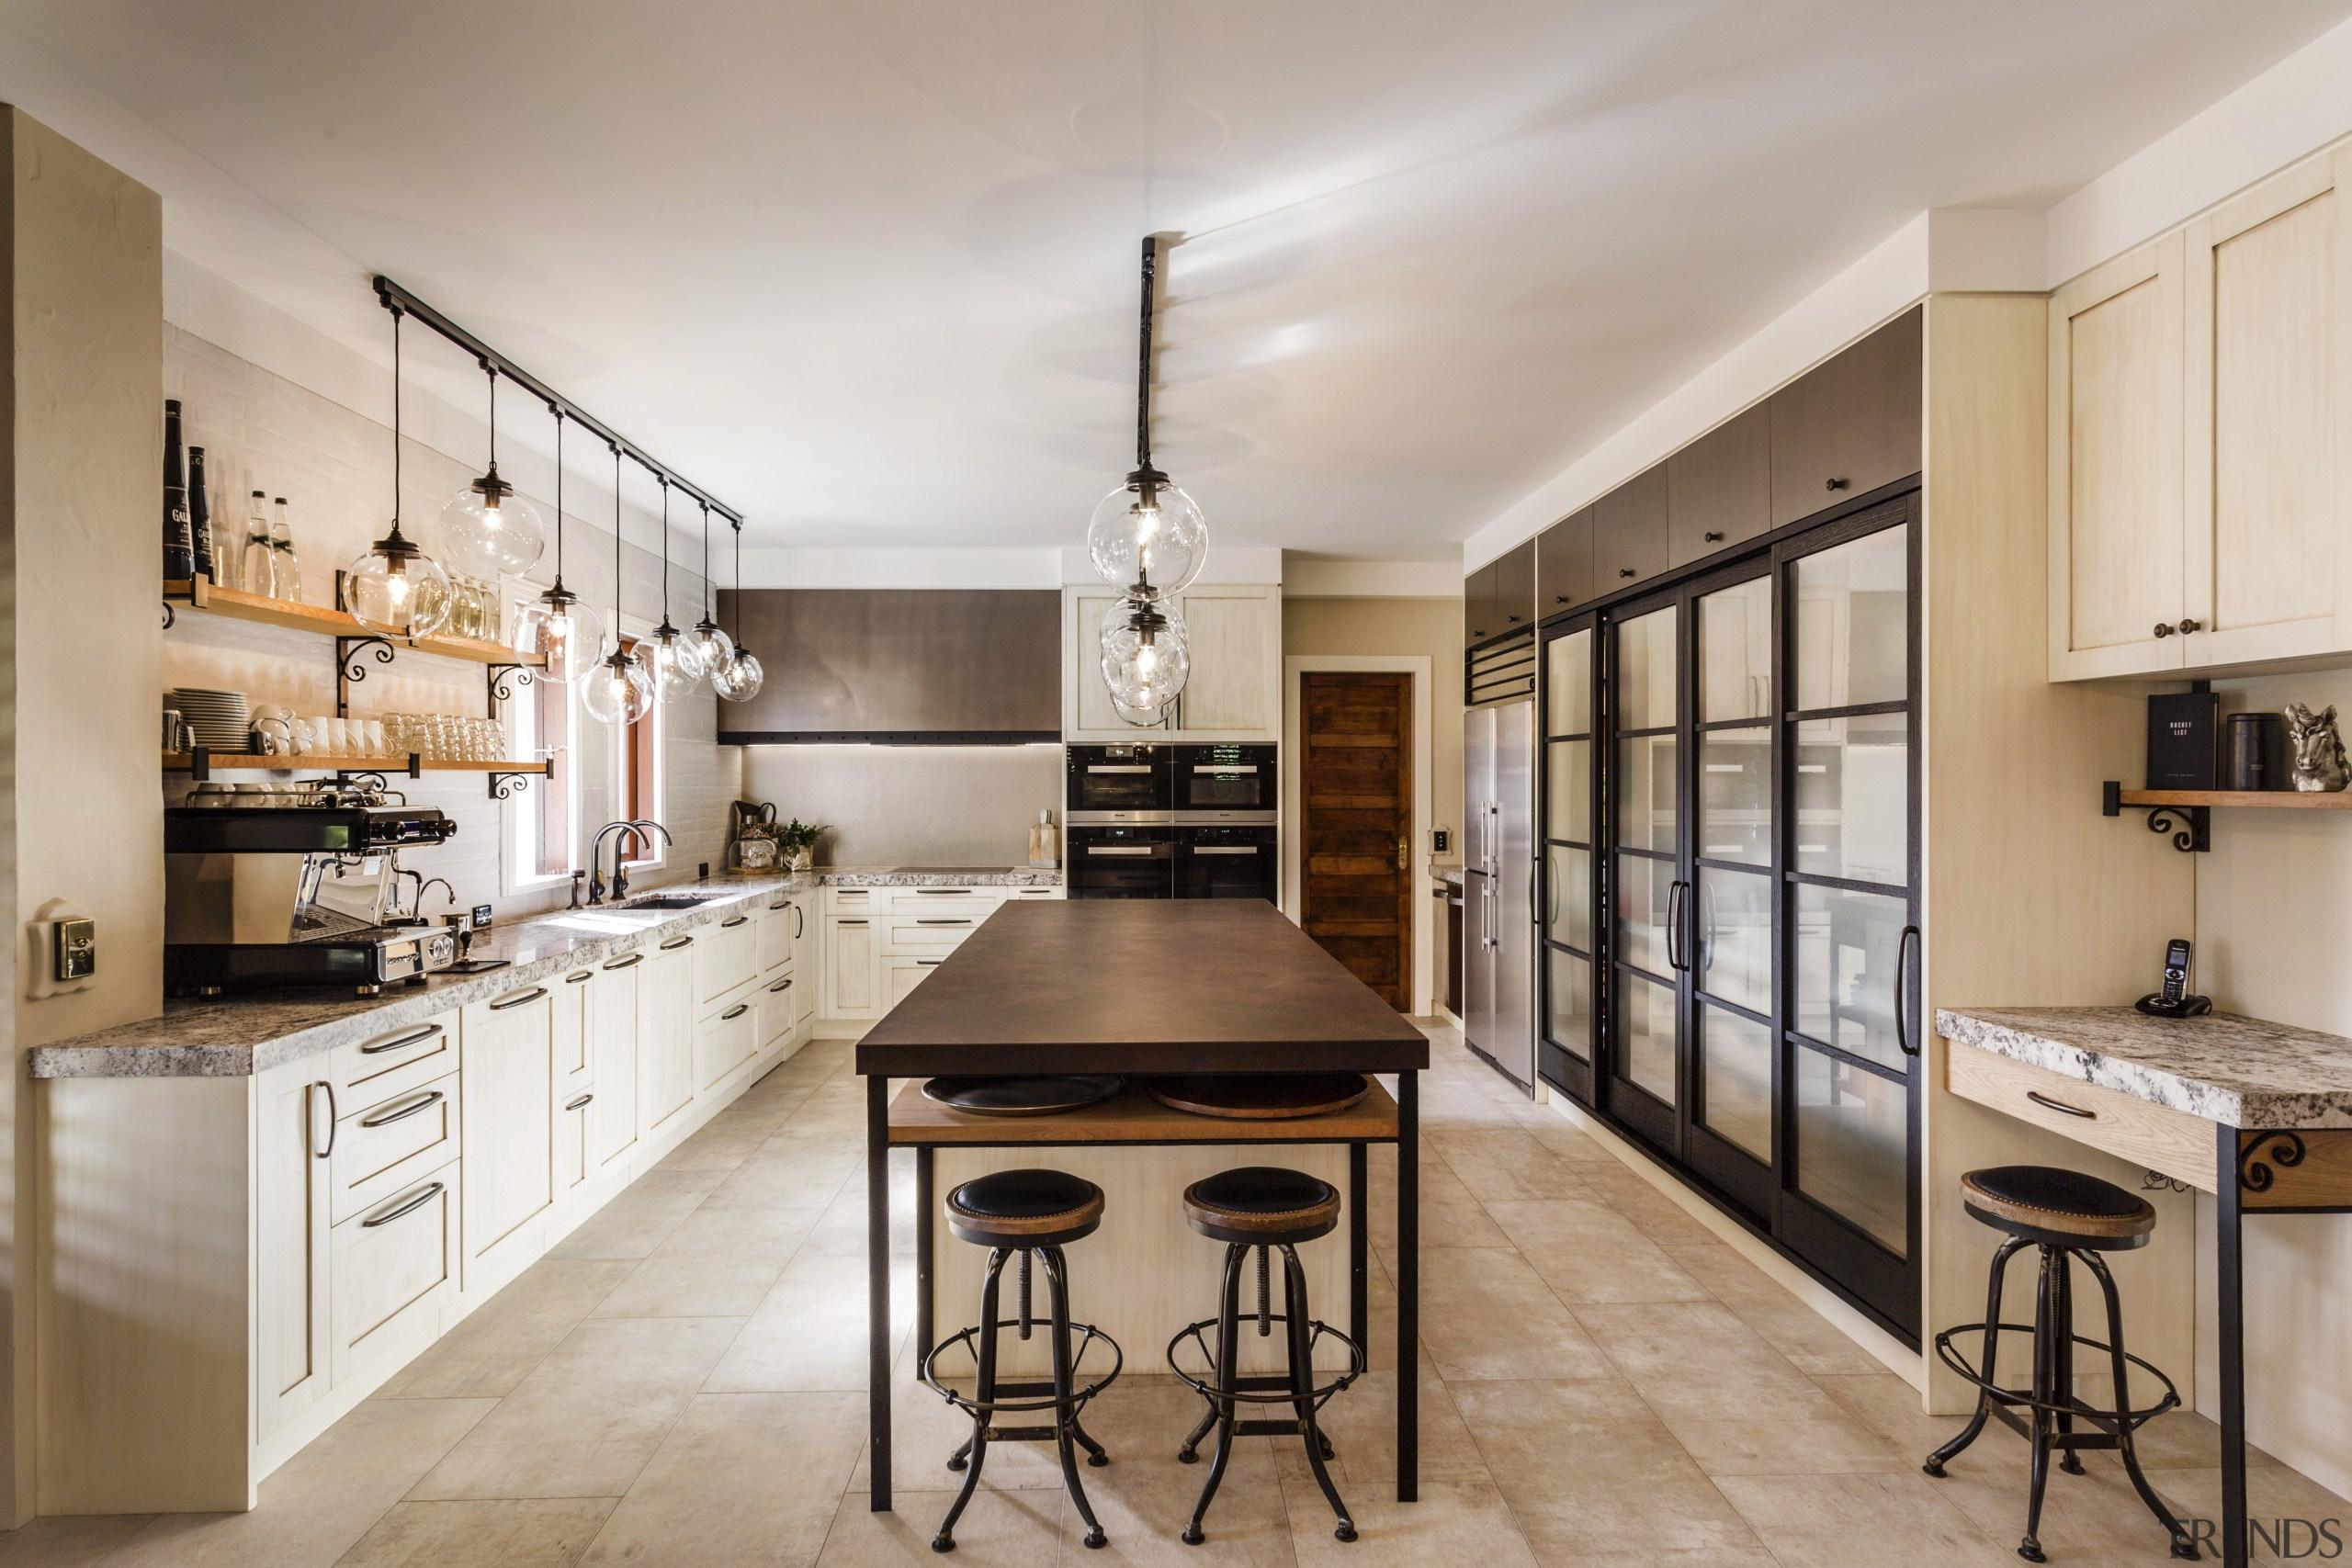 Same space, quite different agenda  this reinvented cabinetry, countertop, cuisine classique, interior design, kitchen, gray